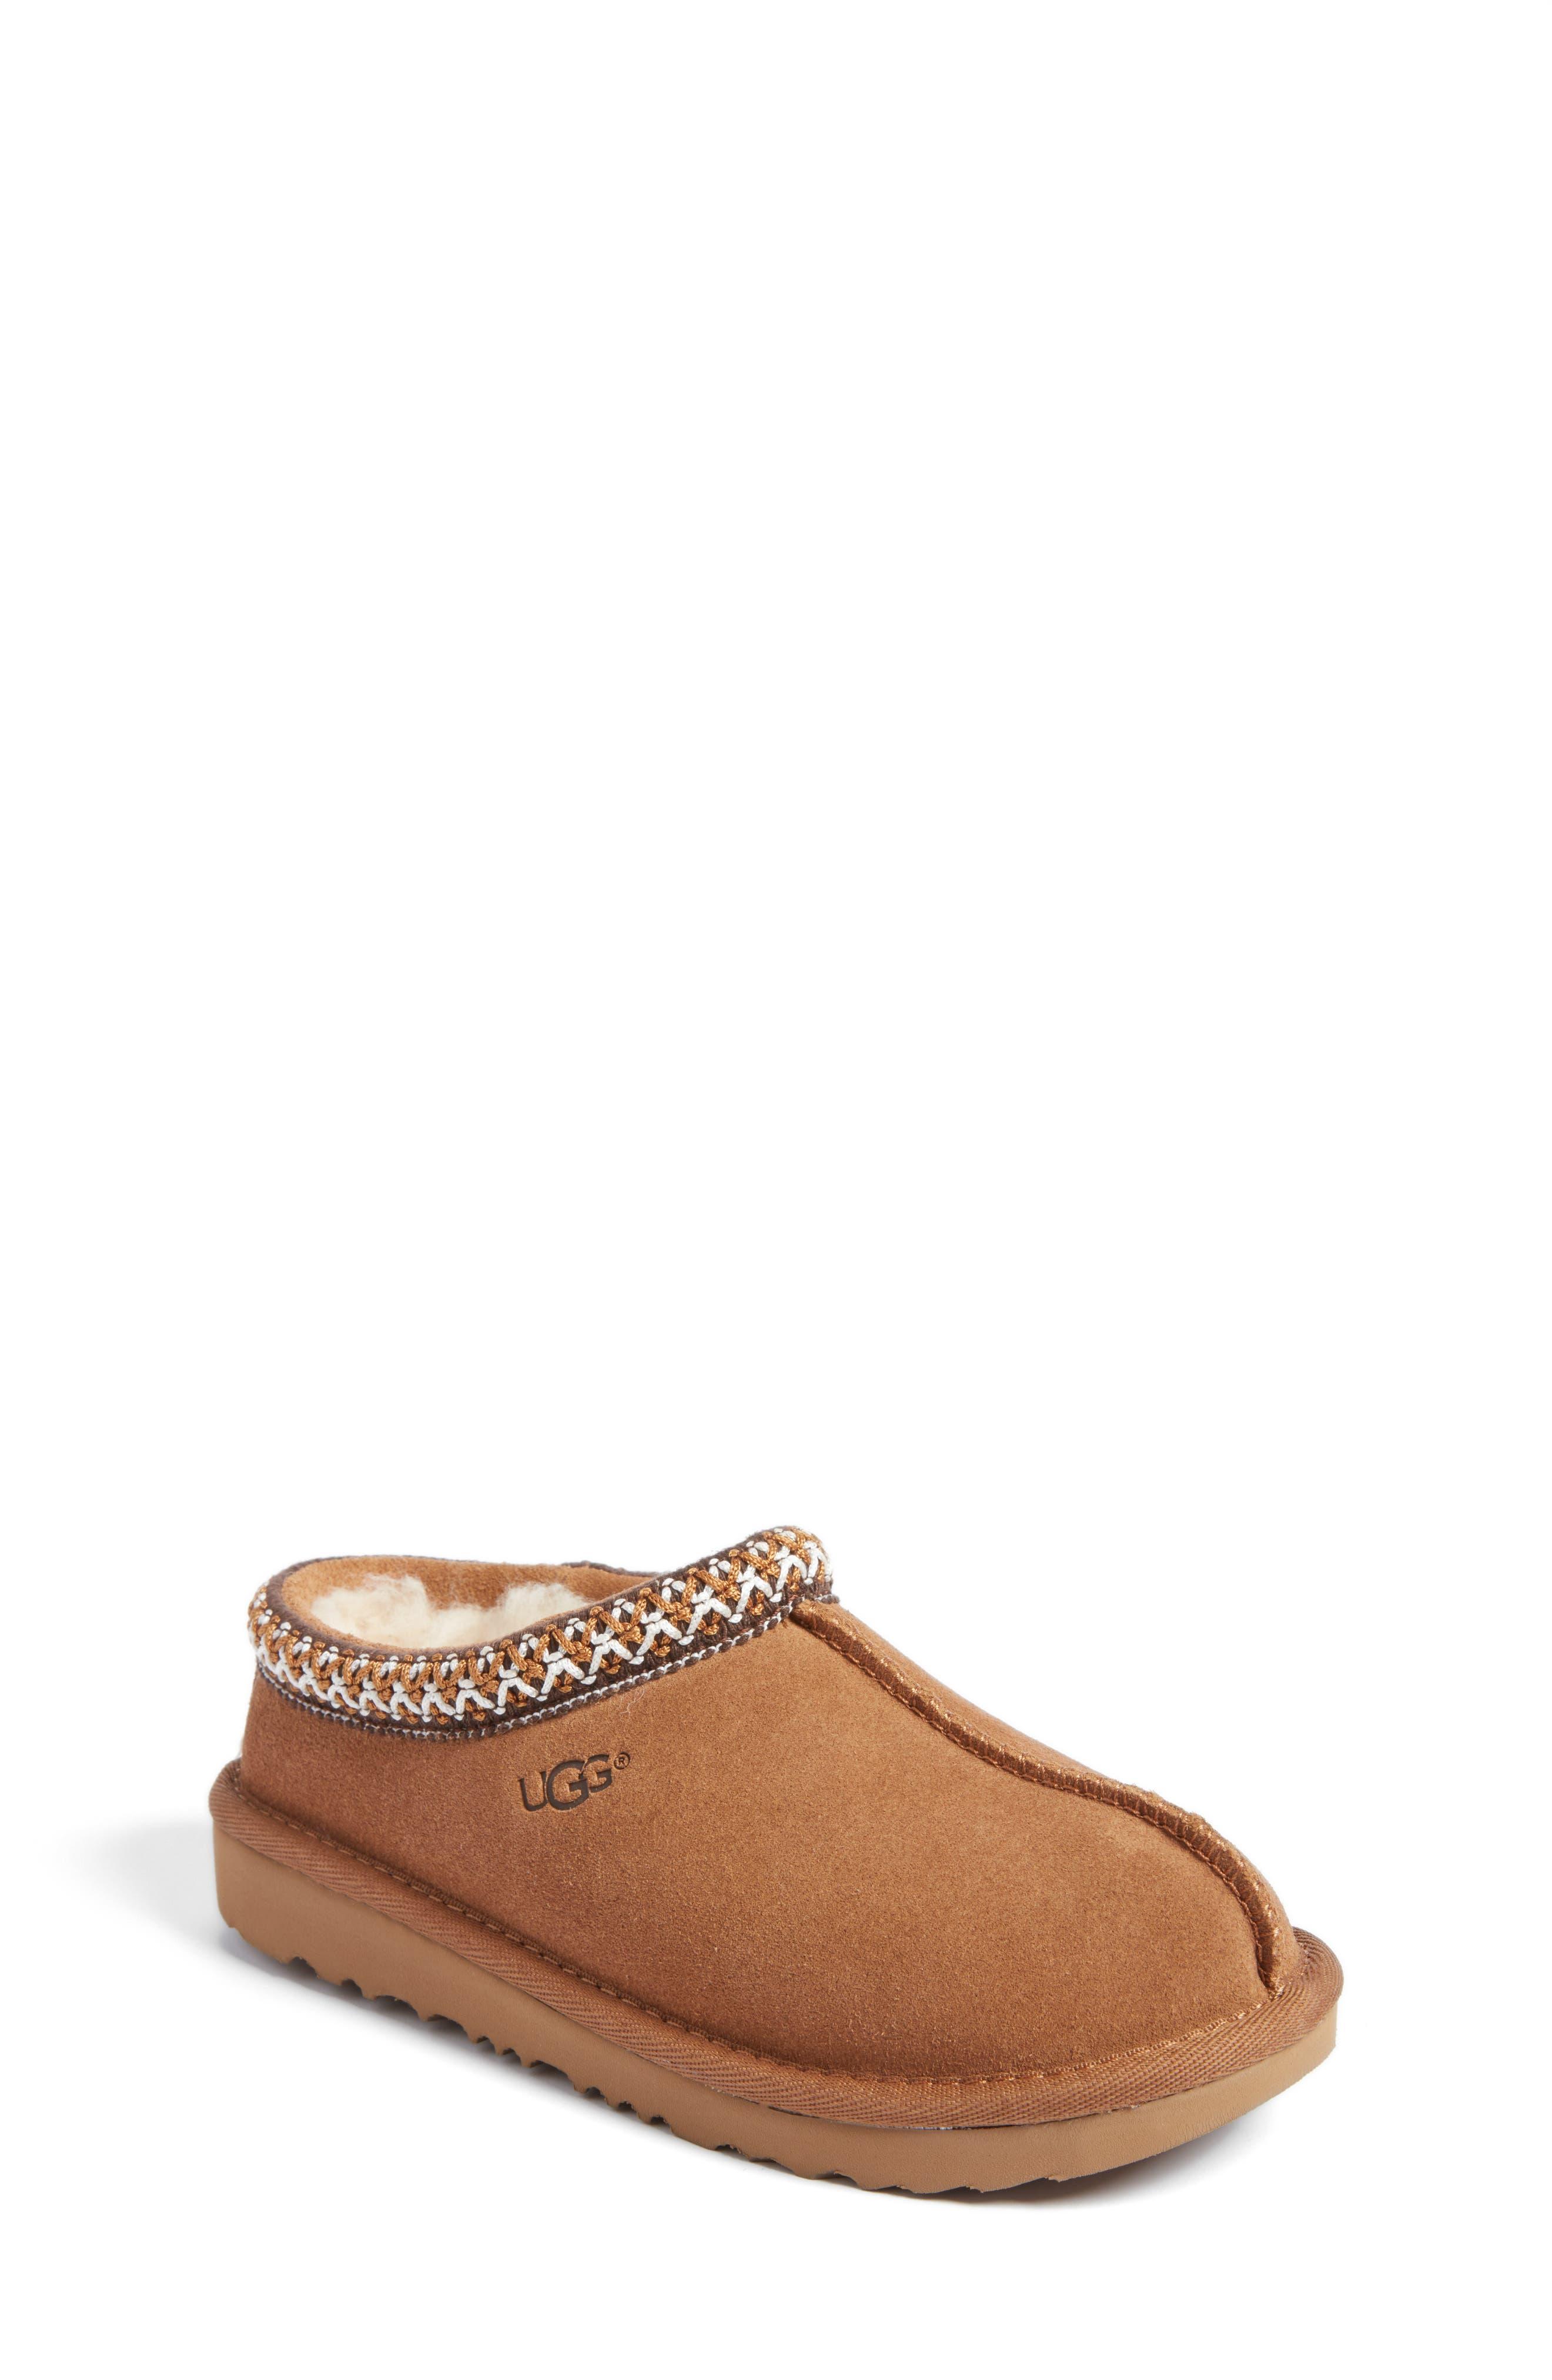 Toddler Boys' UGG® Shoes (Sizes 7.5-12)